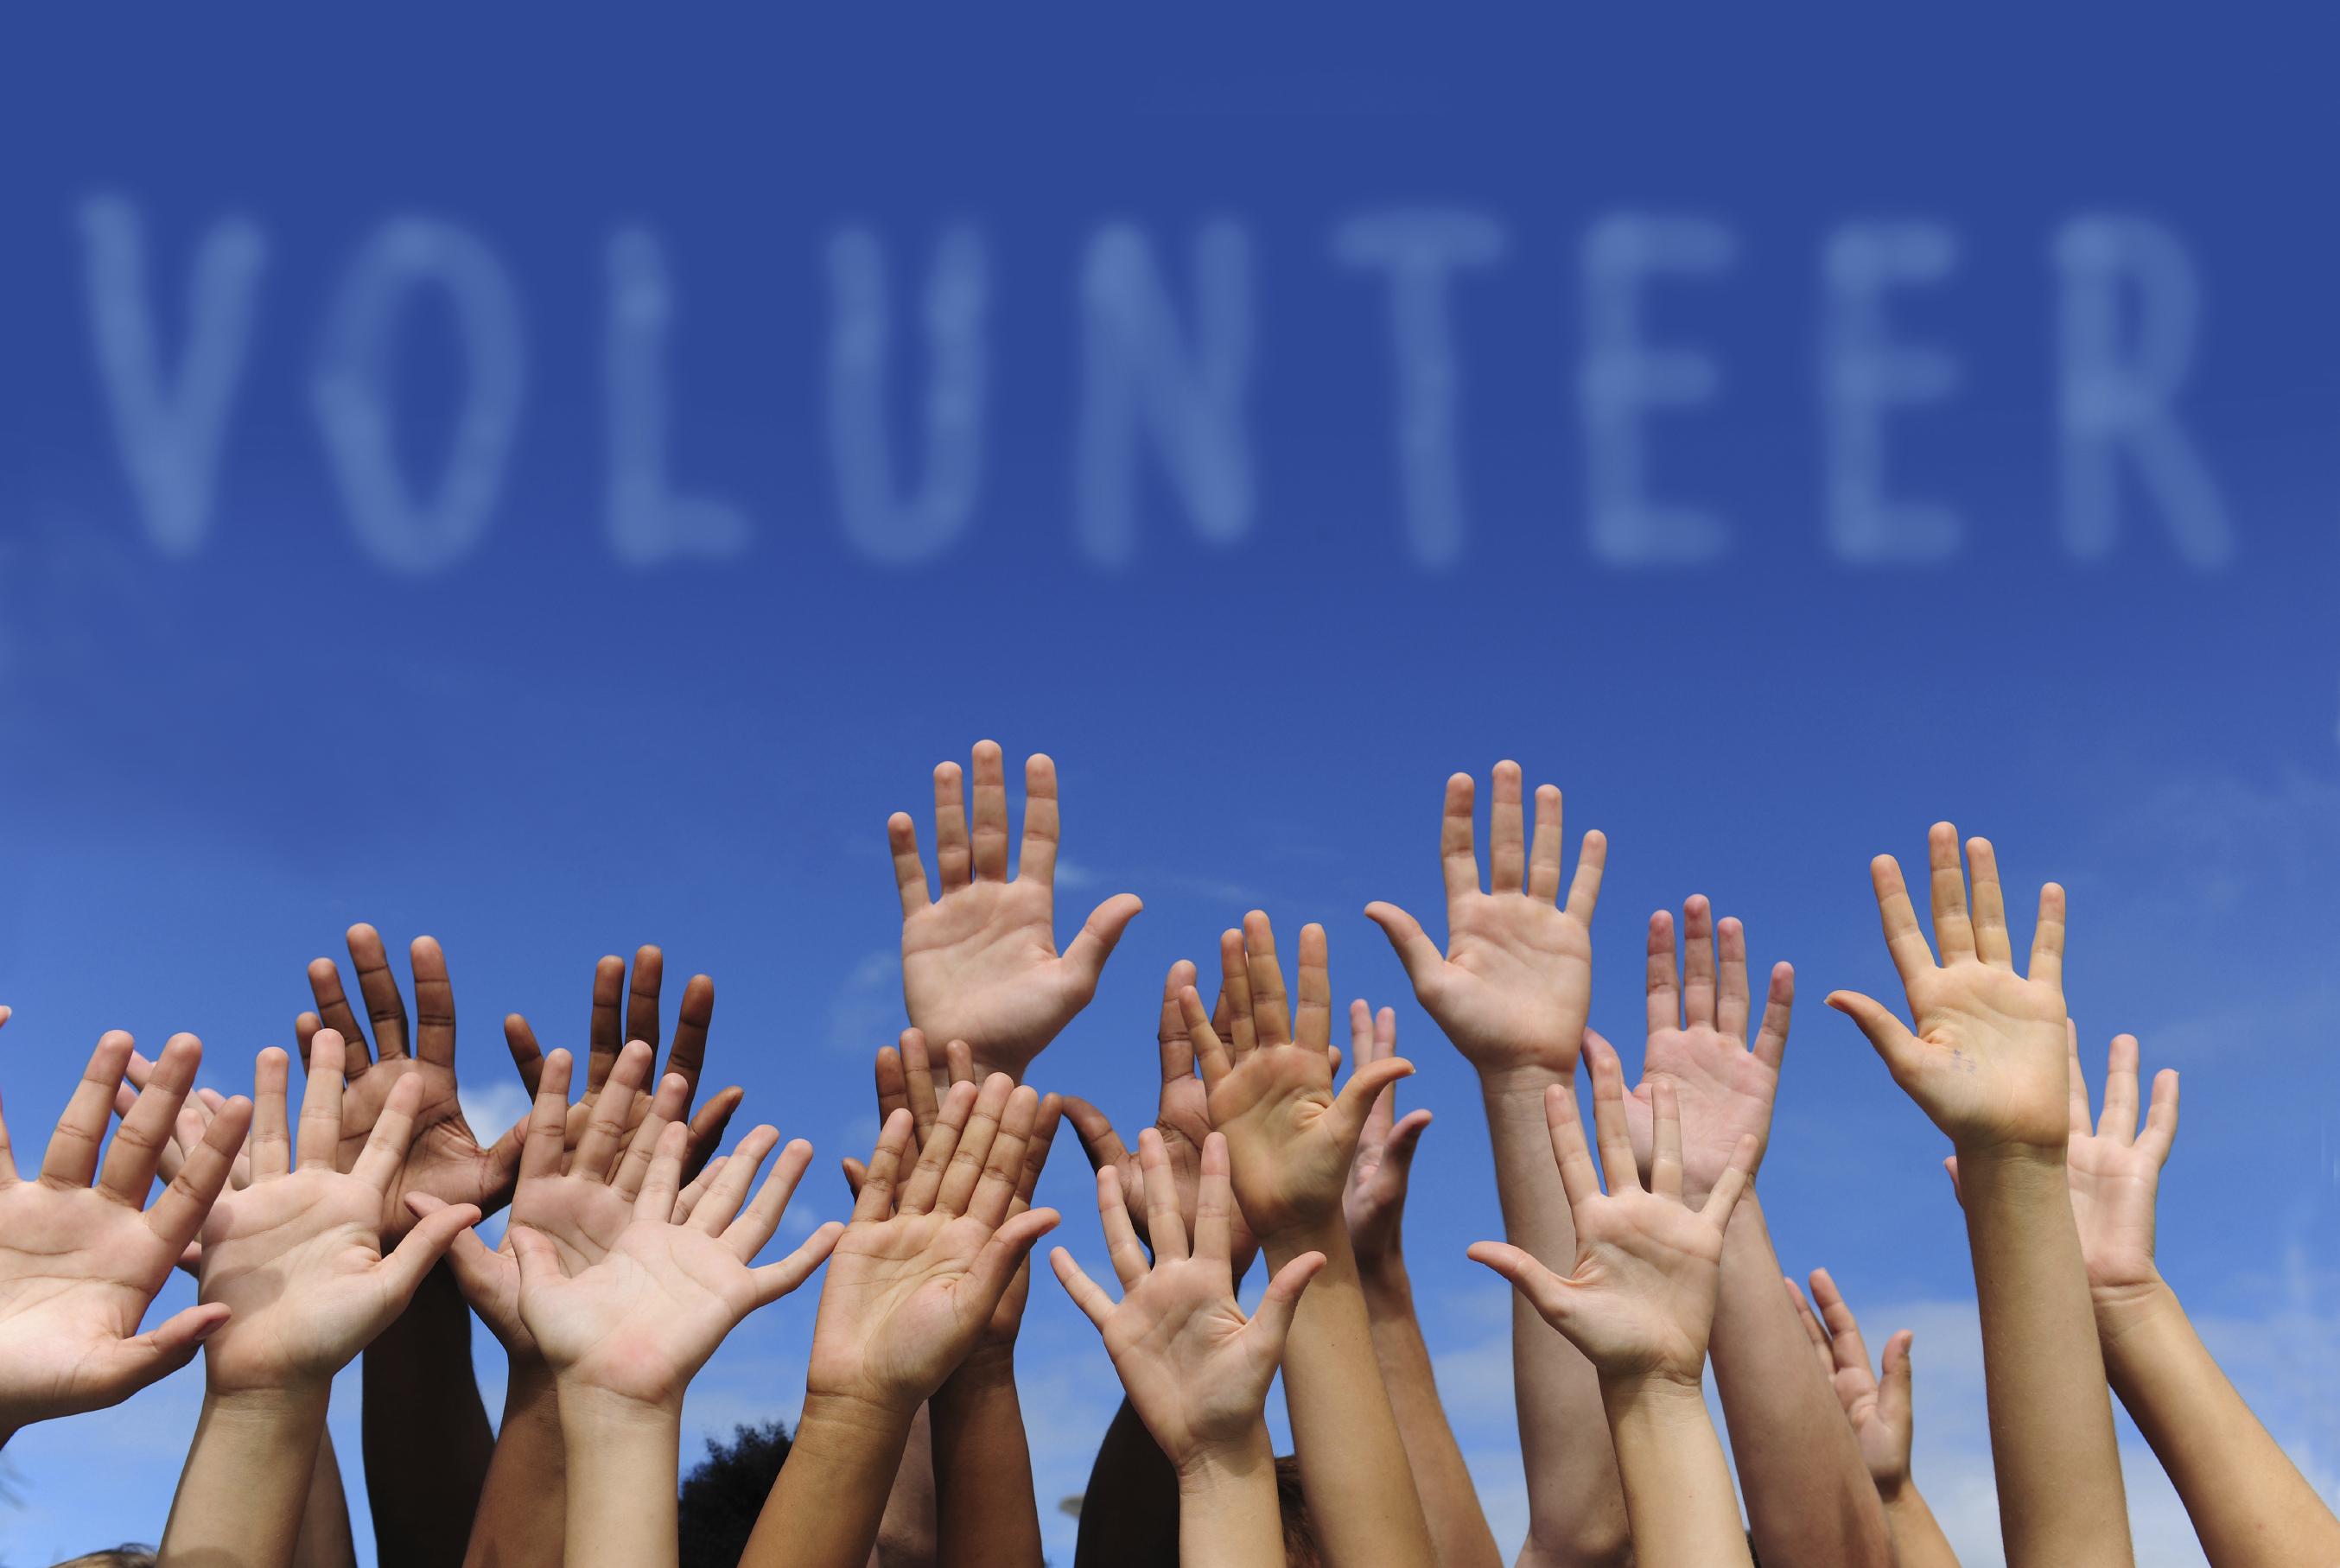 volunteer image iStock_000016475829Large.jpg